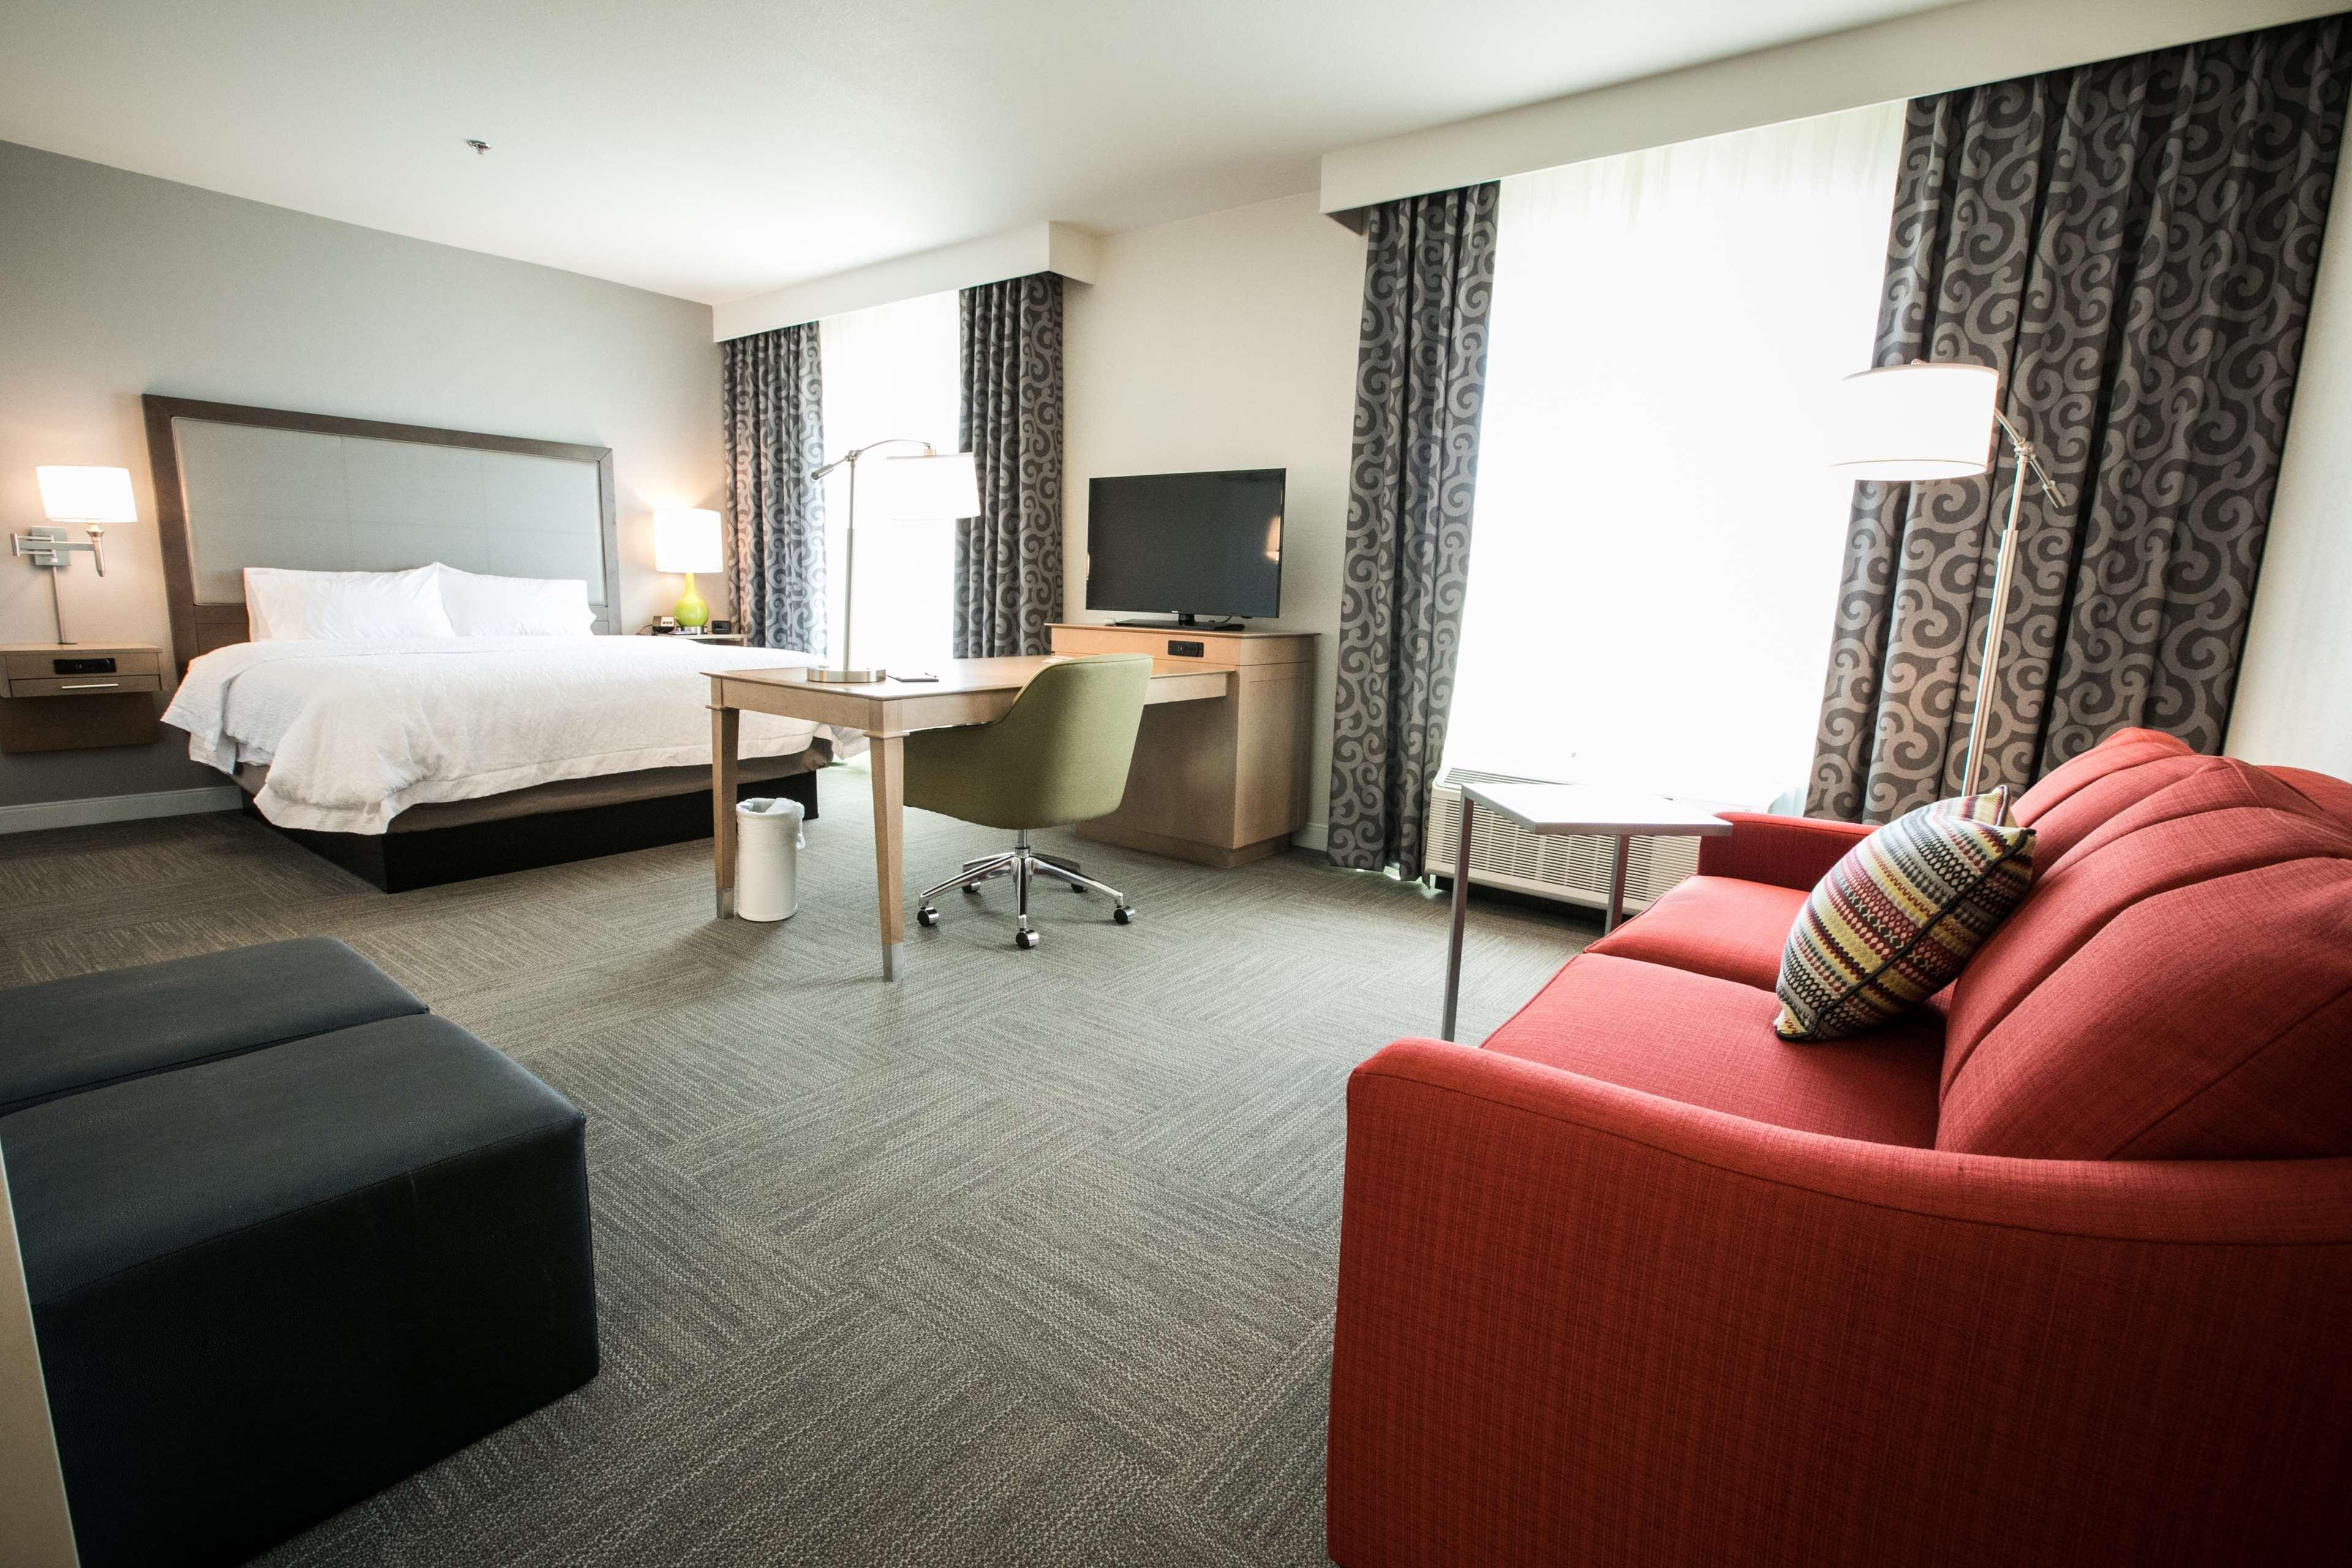 Hampton Inn & Suites Tempe - Phoenix Airport image 36